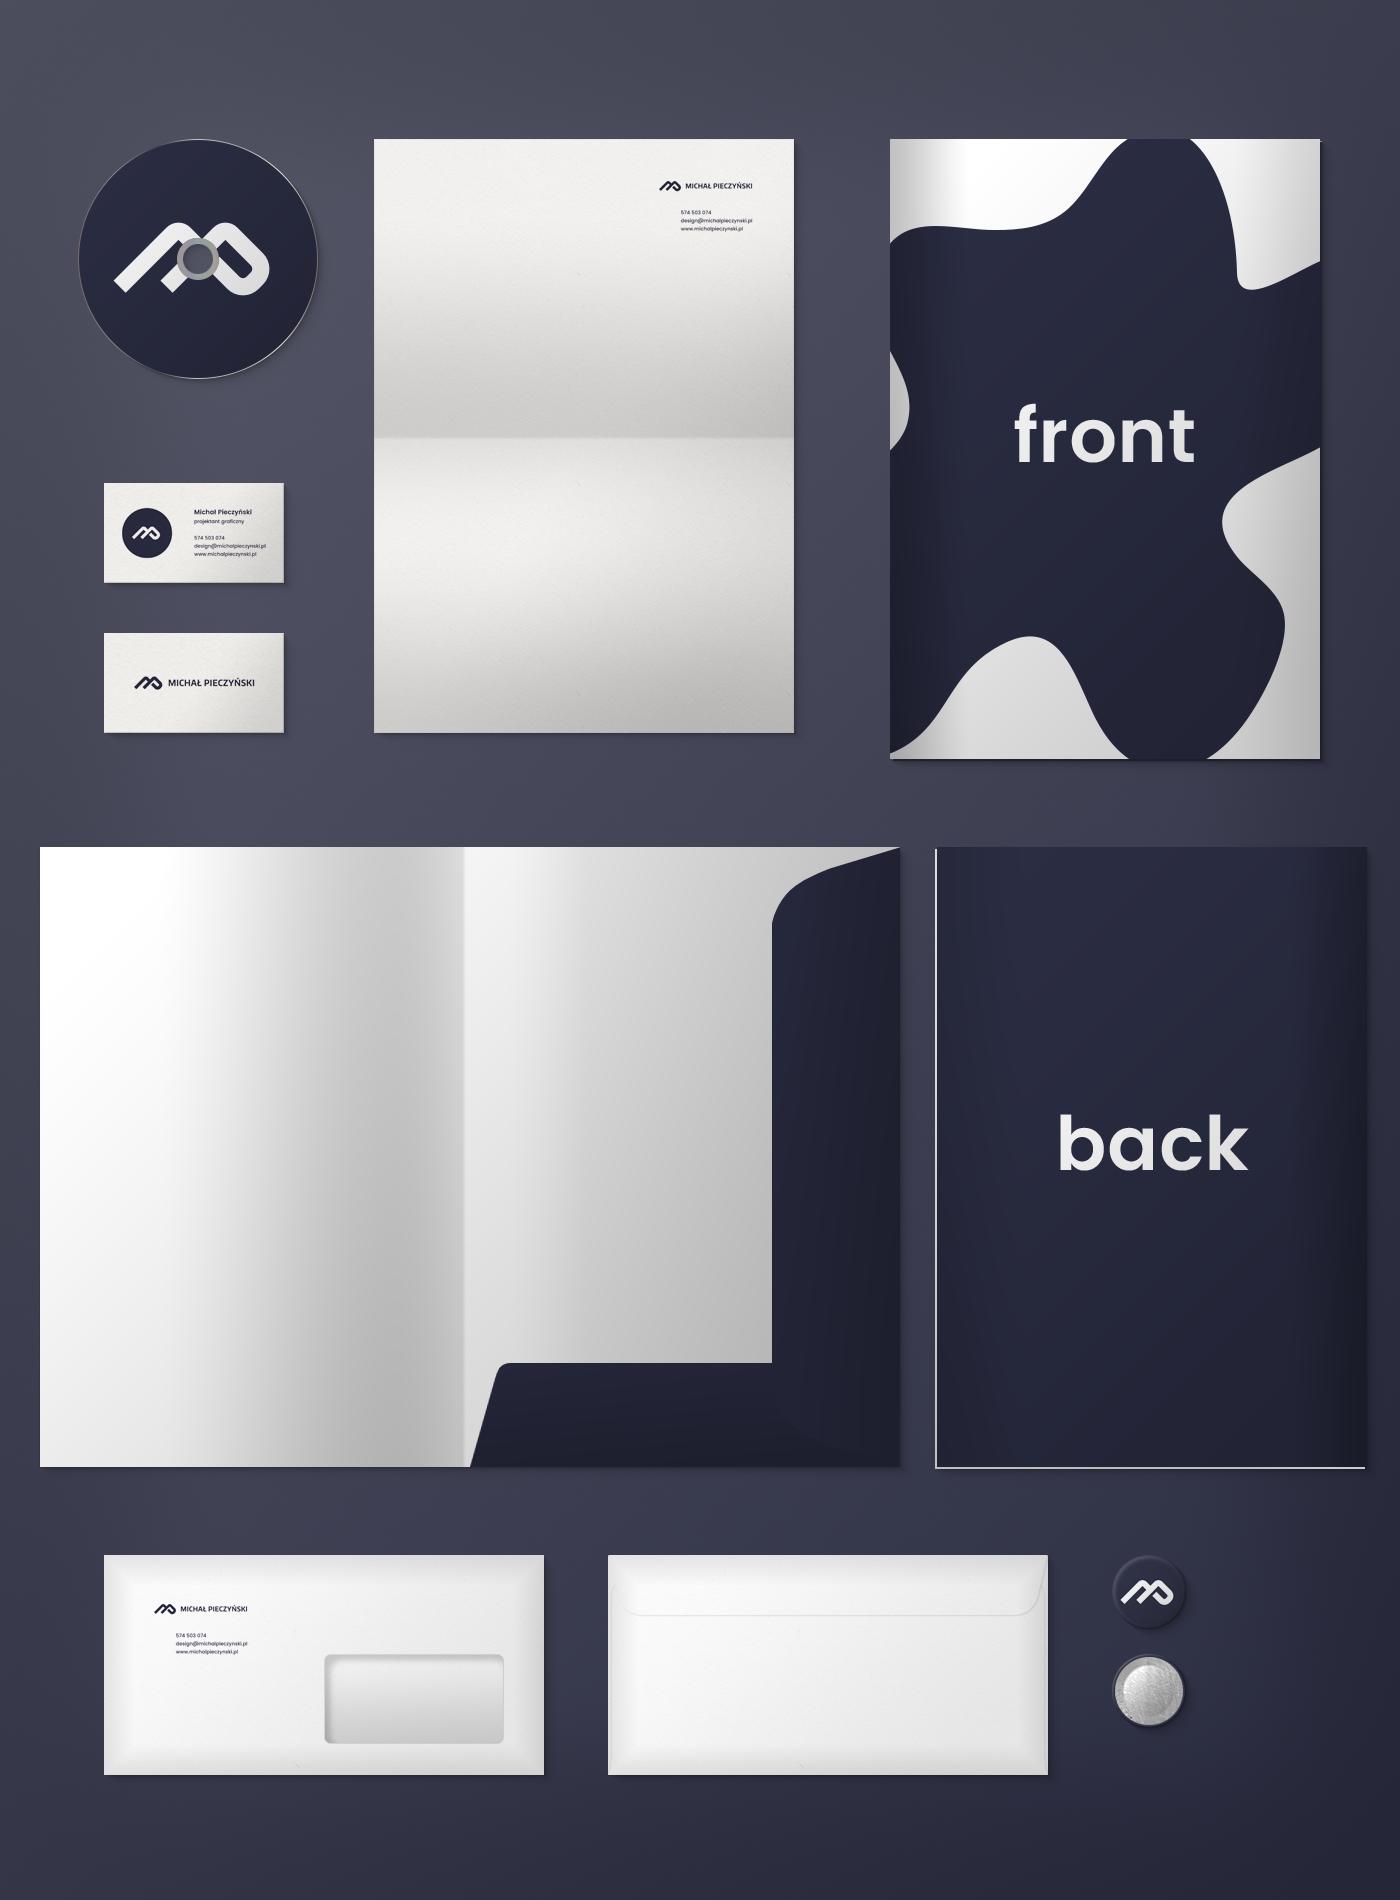 Mockup mock up folder business card letterhead psd stationary identity branding  envelope